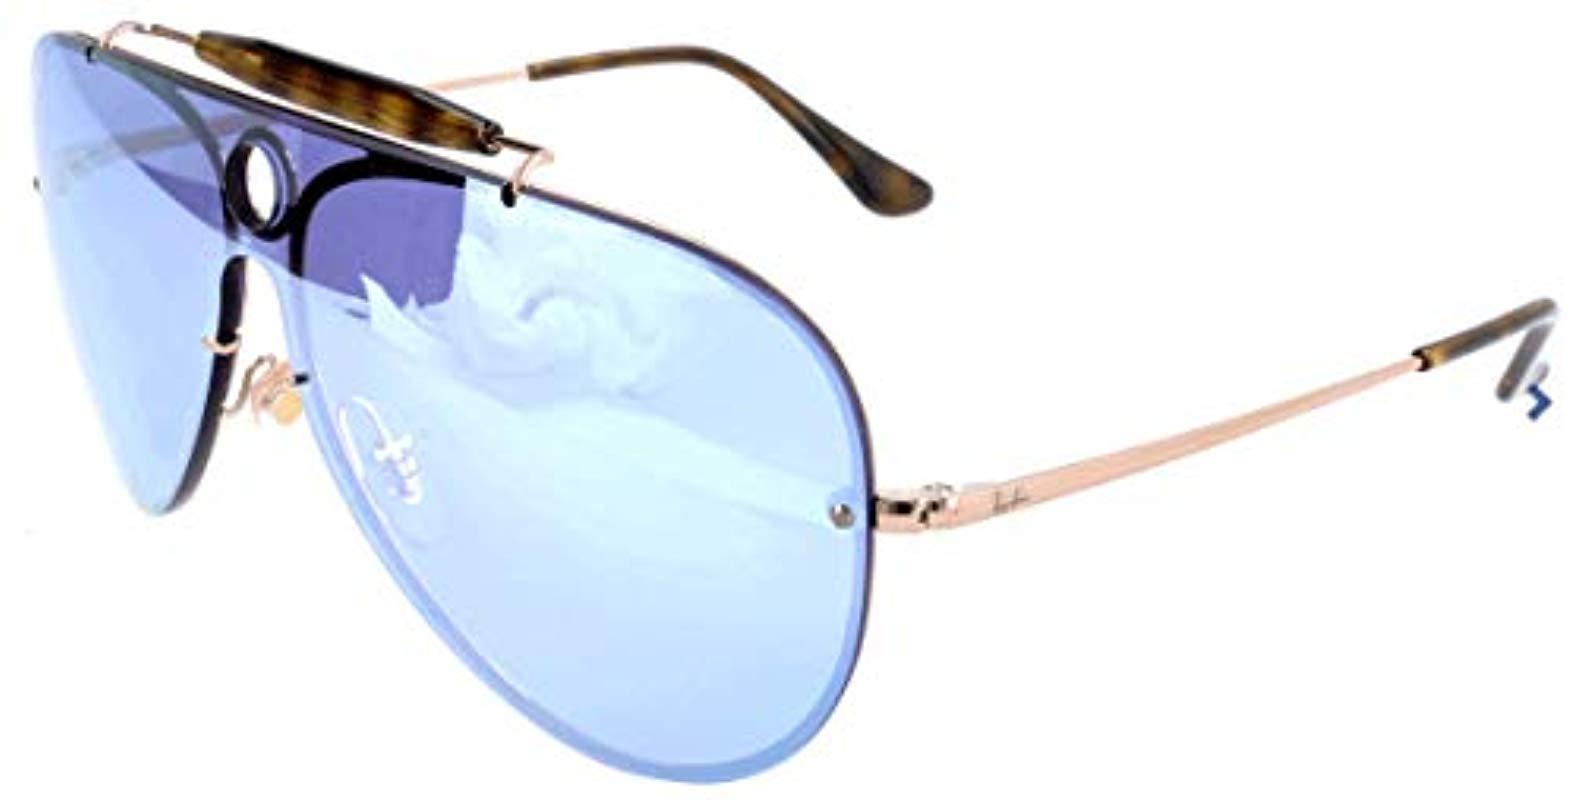 8b5ef6eccb84e Ray-Ban Blaze Shooter Sunglasses In Copper Silver Violet Mirror ...